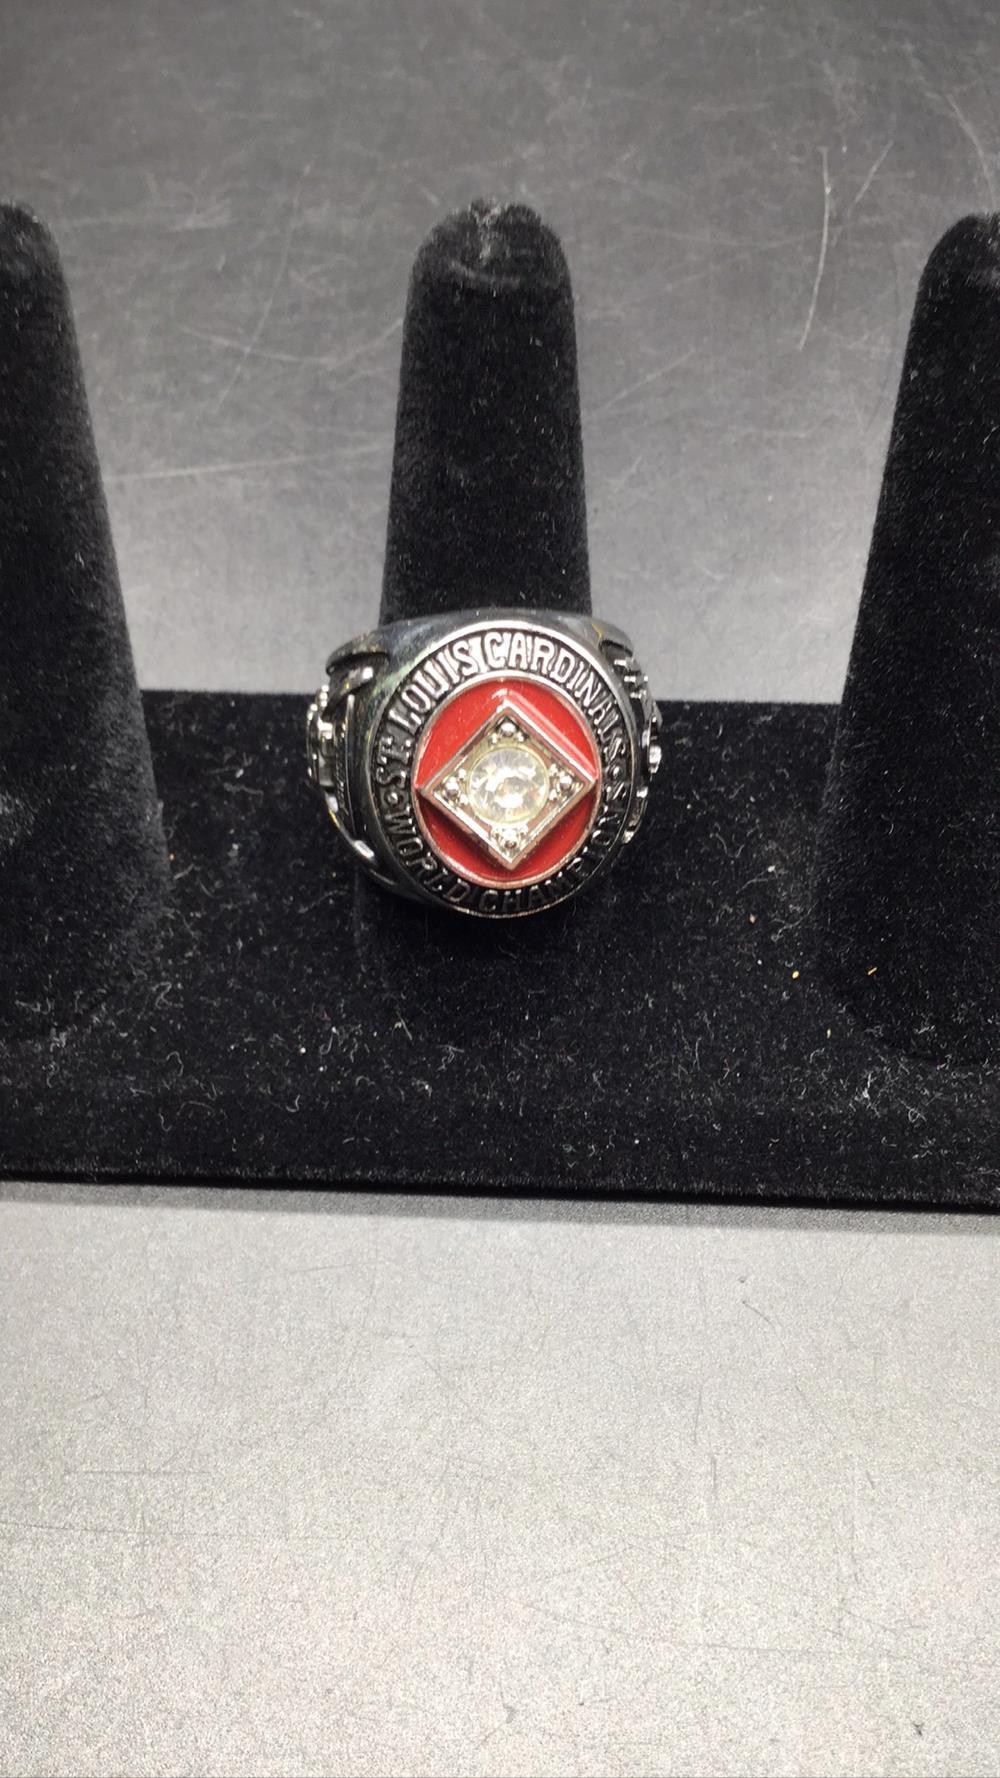 St. Louis cardinals championship ring